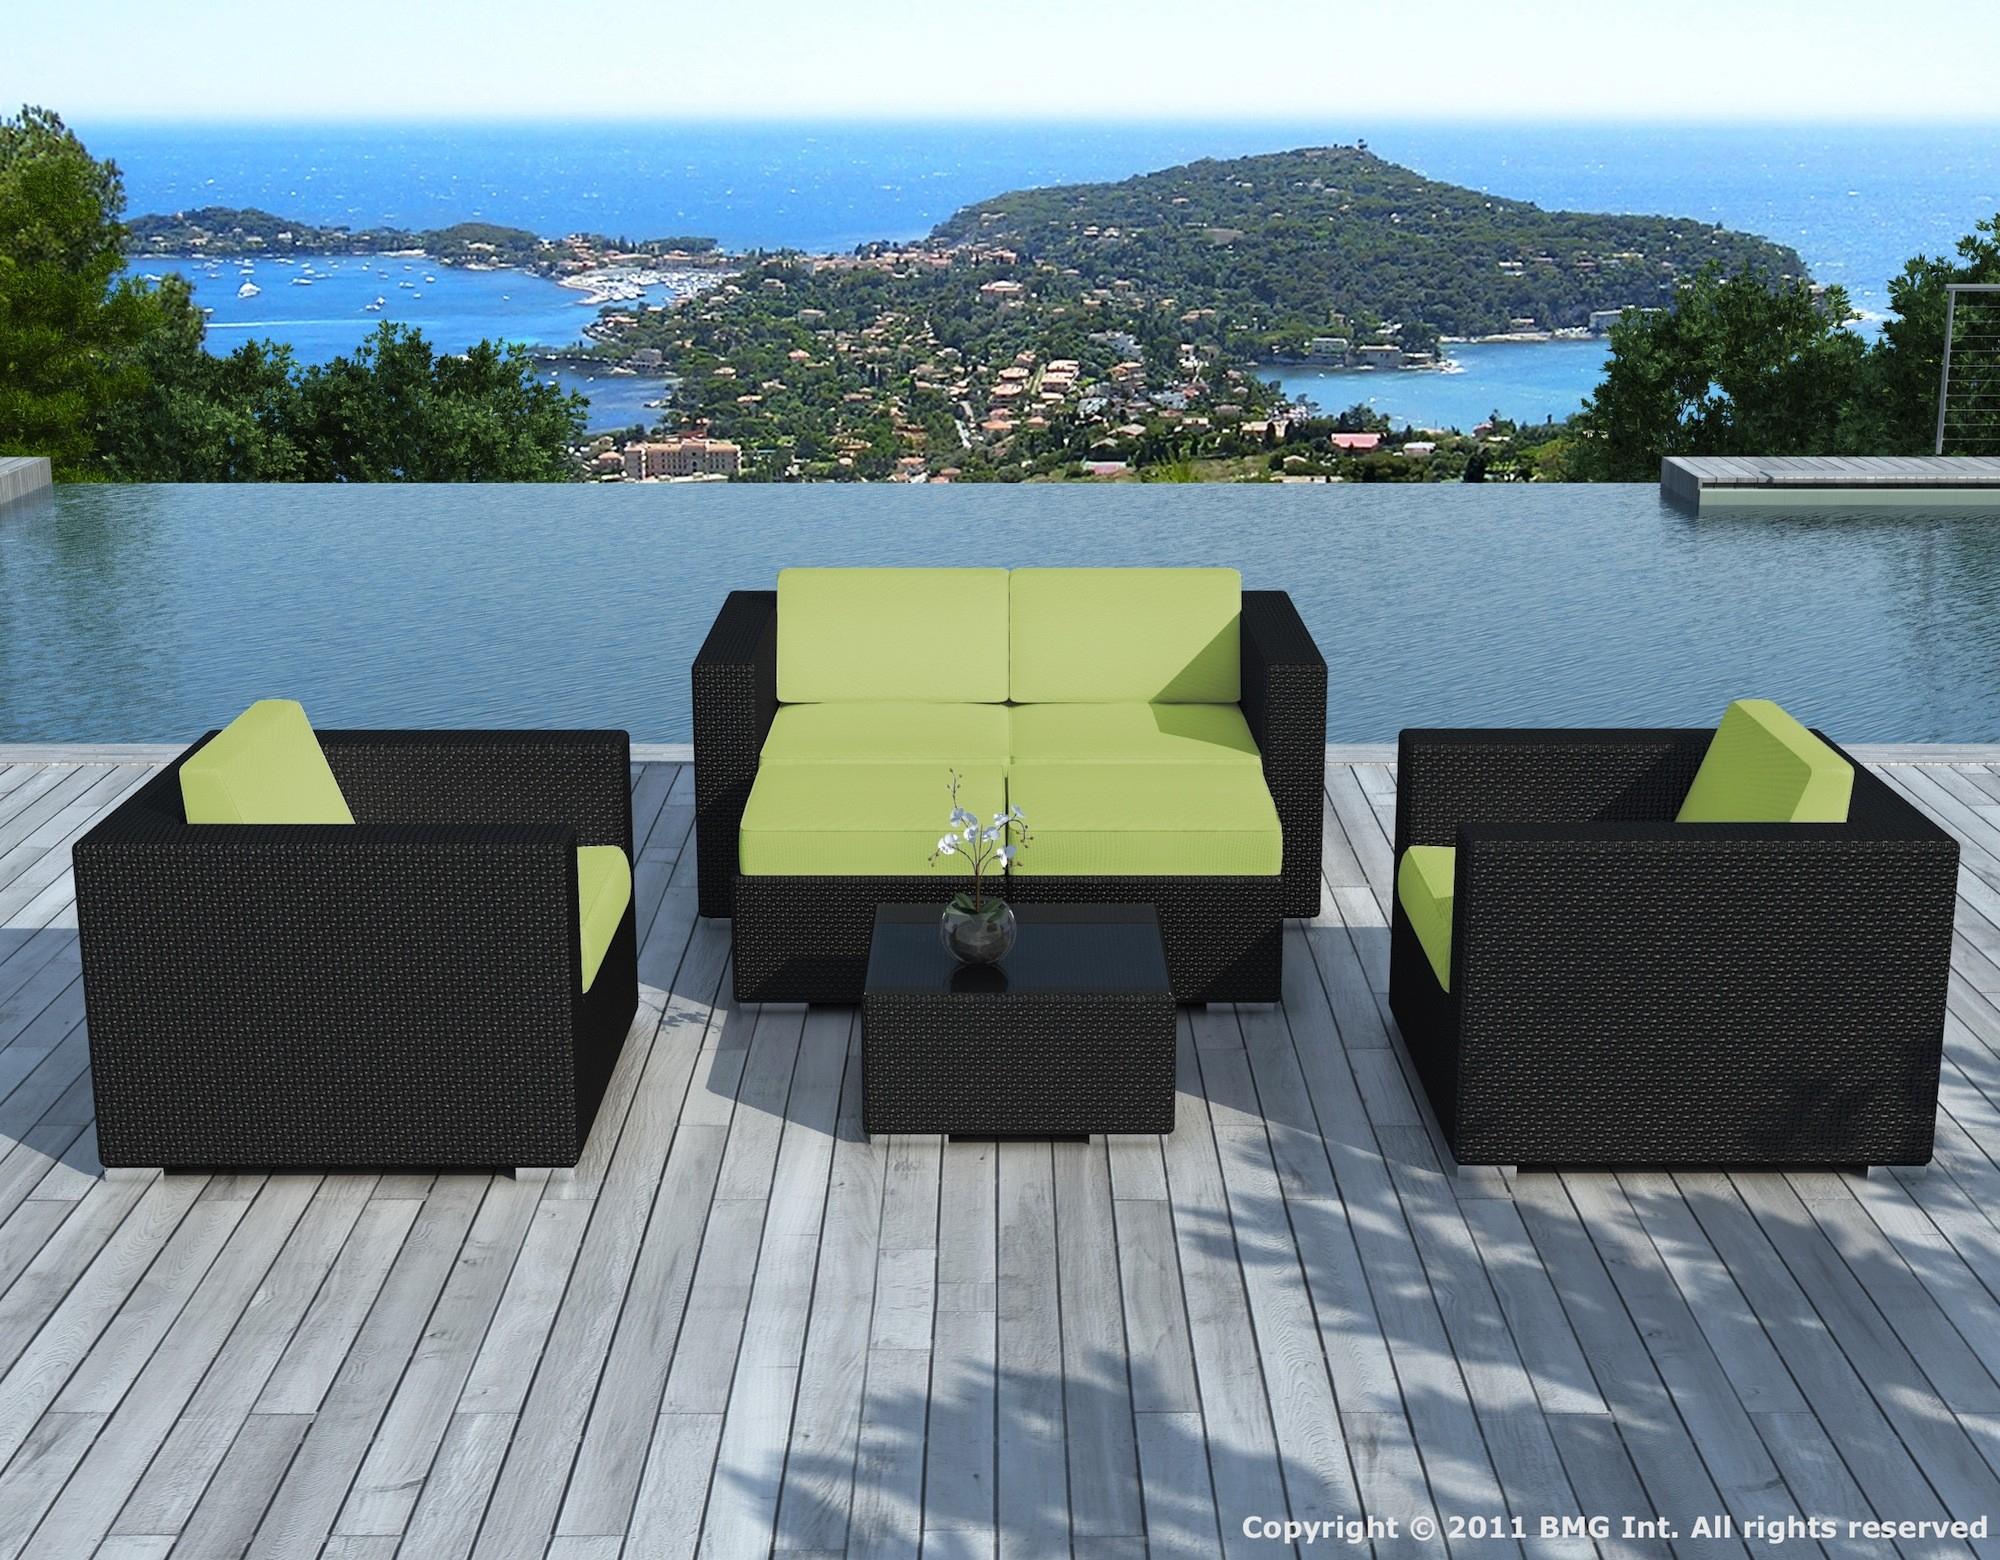 Salon De Jardin En Résine Tressée Noire/vert - Pausa - Delorm Design avec Salon De Jardin Moorea